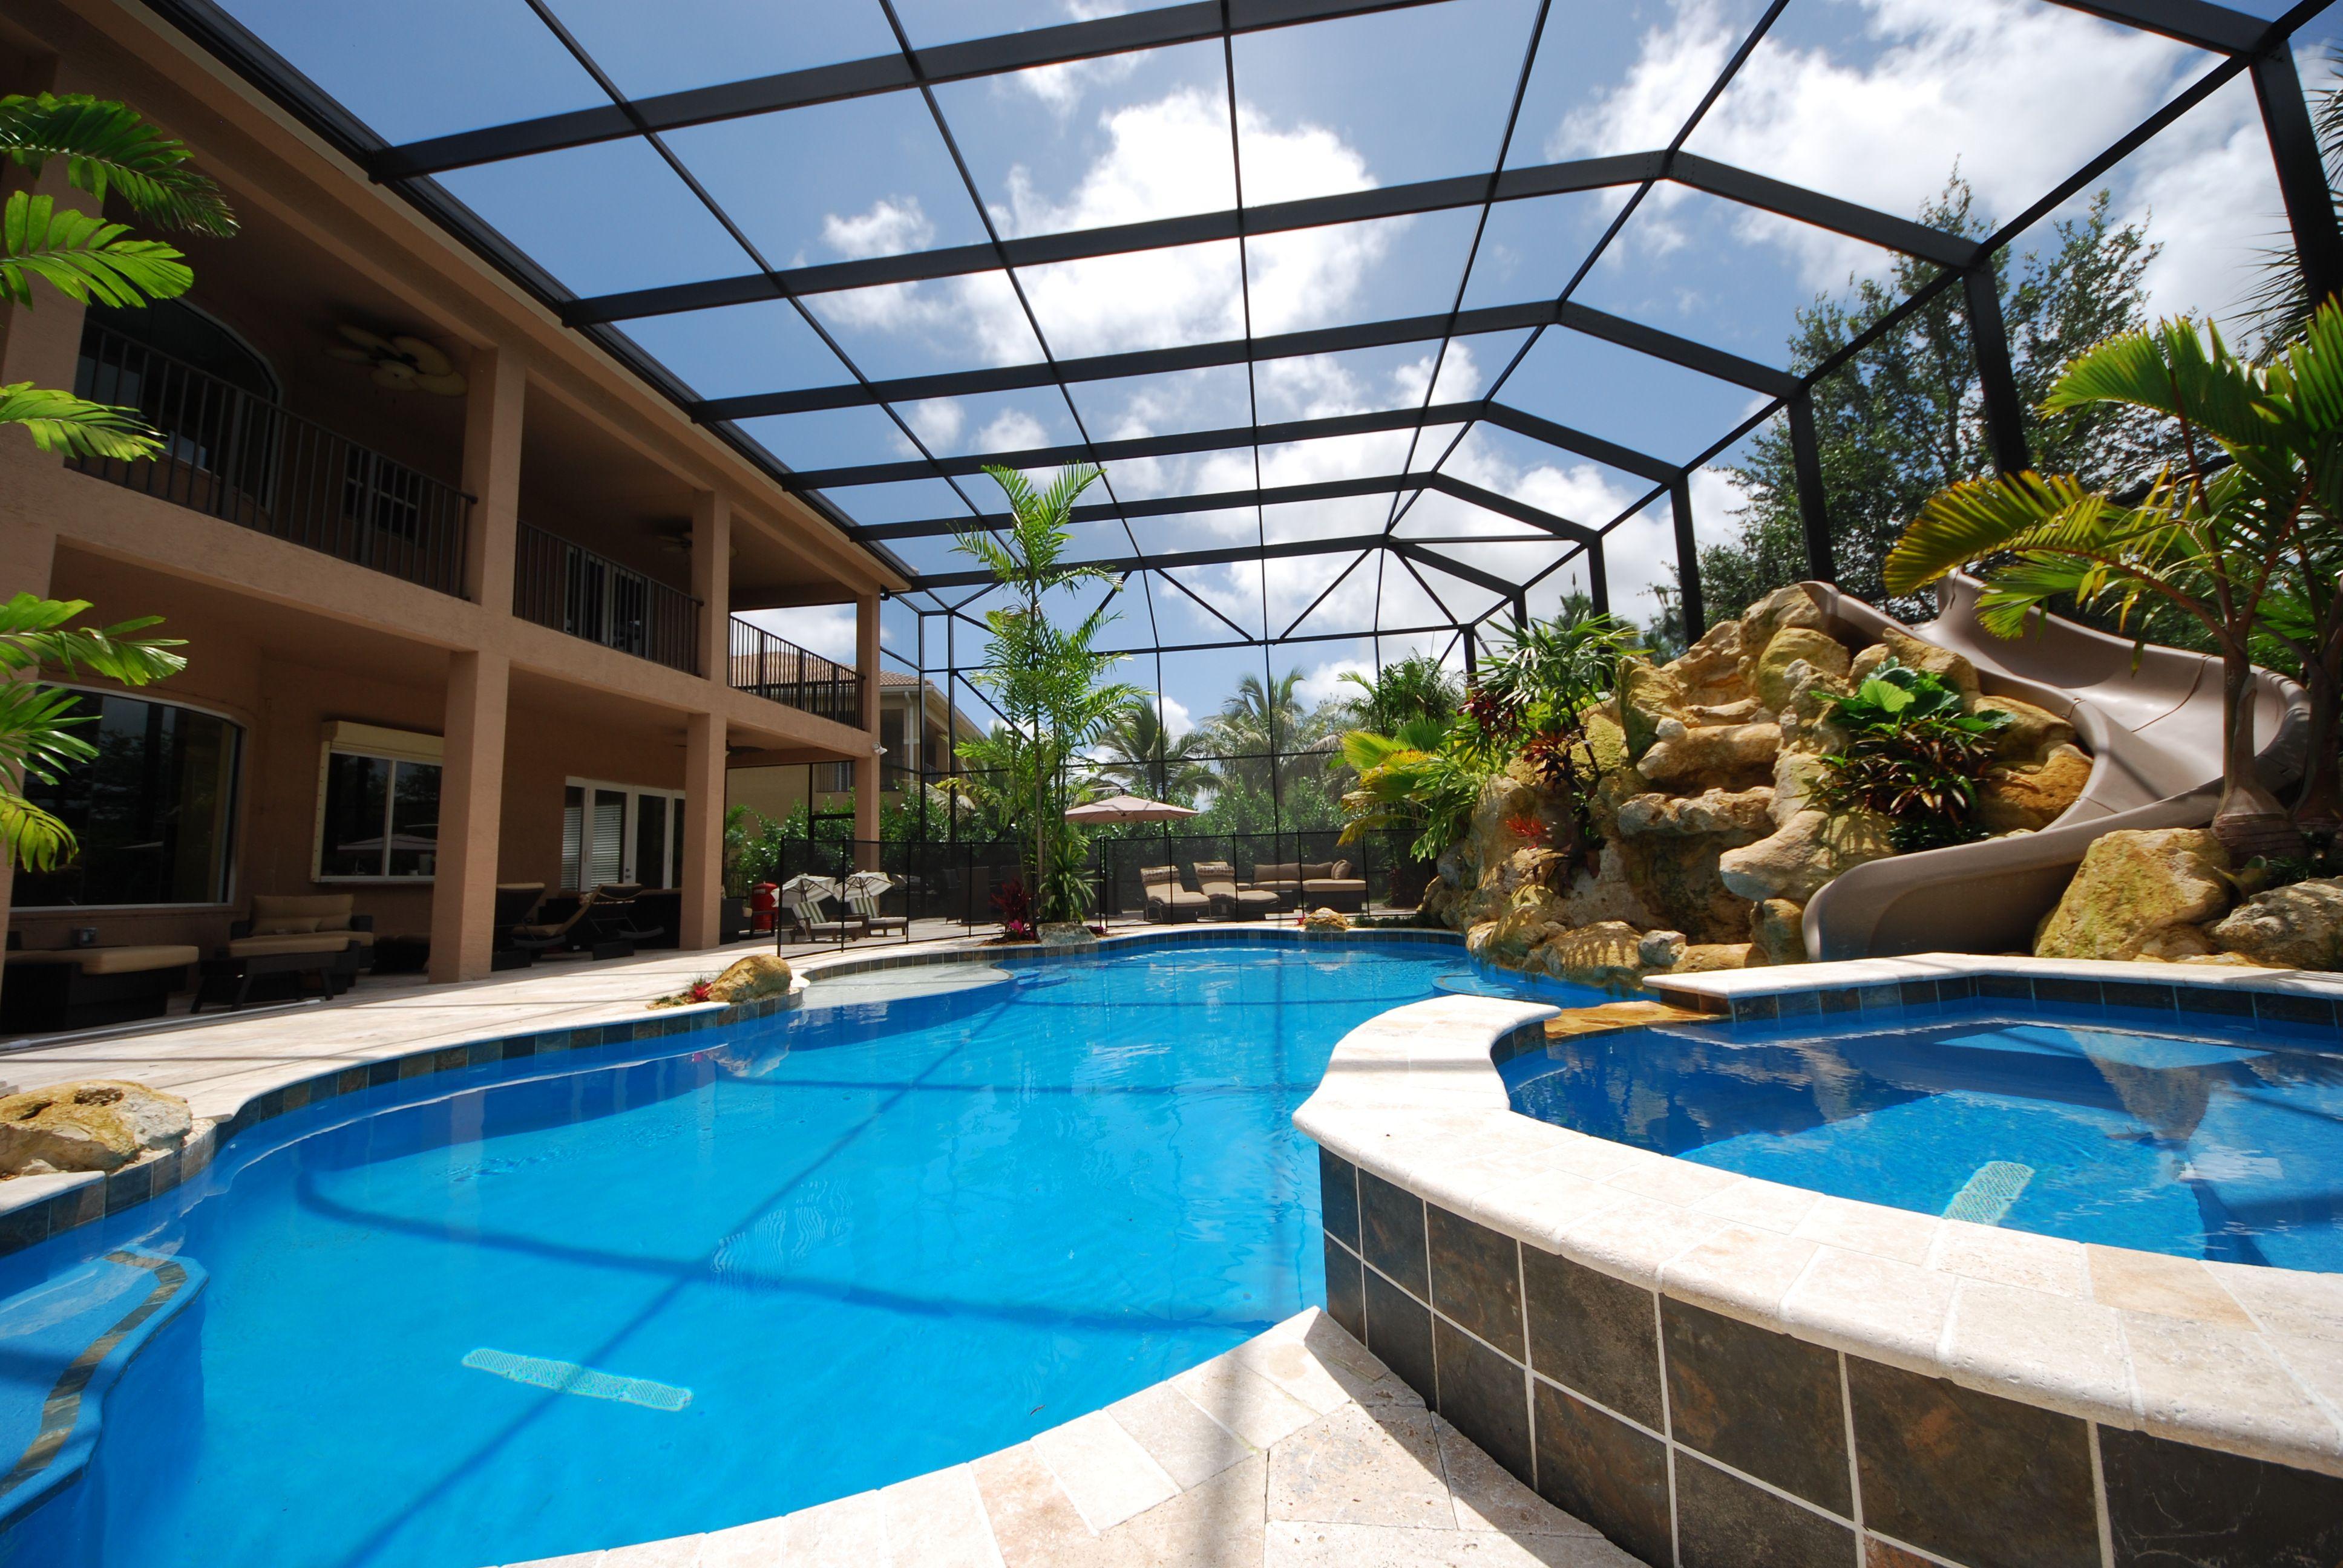 Two Story Screen Enclosure Backyard Pool Landscaping Dream Pools Backyard Pool